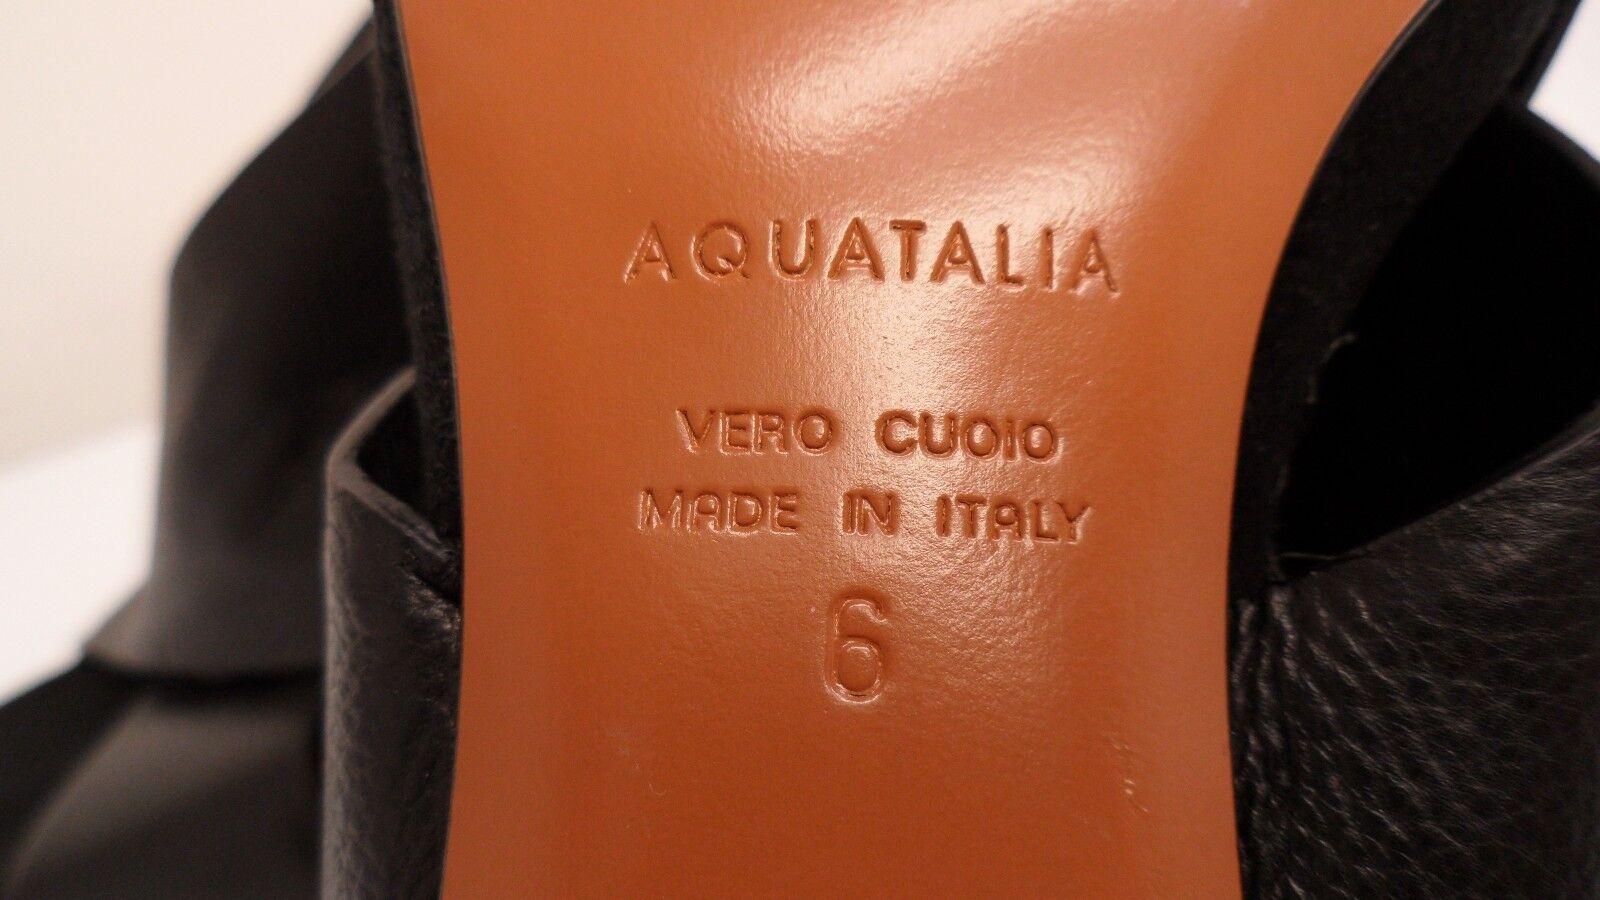 Al por menor  450 Aquatalia bayleigh Negro de de de Piel de Becerro Charol Talla 6 Hecho en Italia 6d2cd8